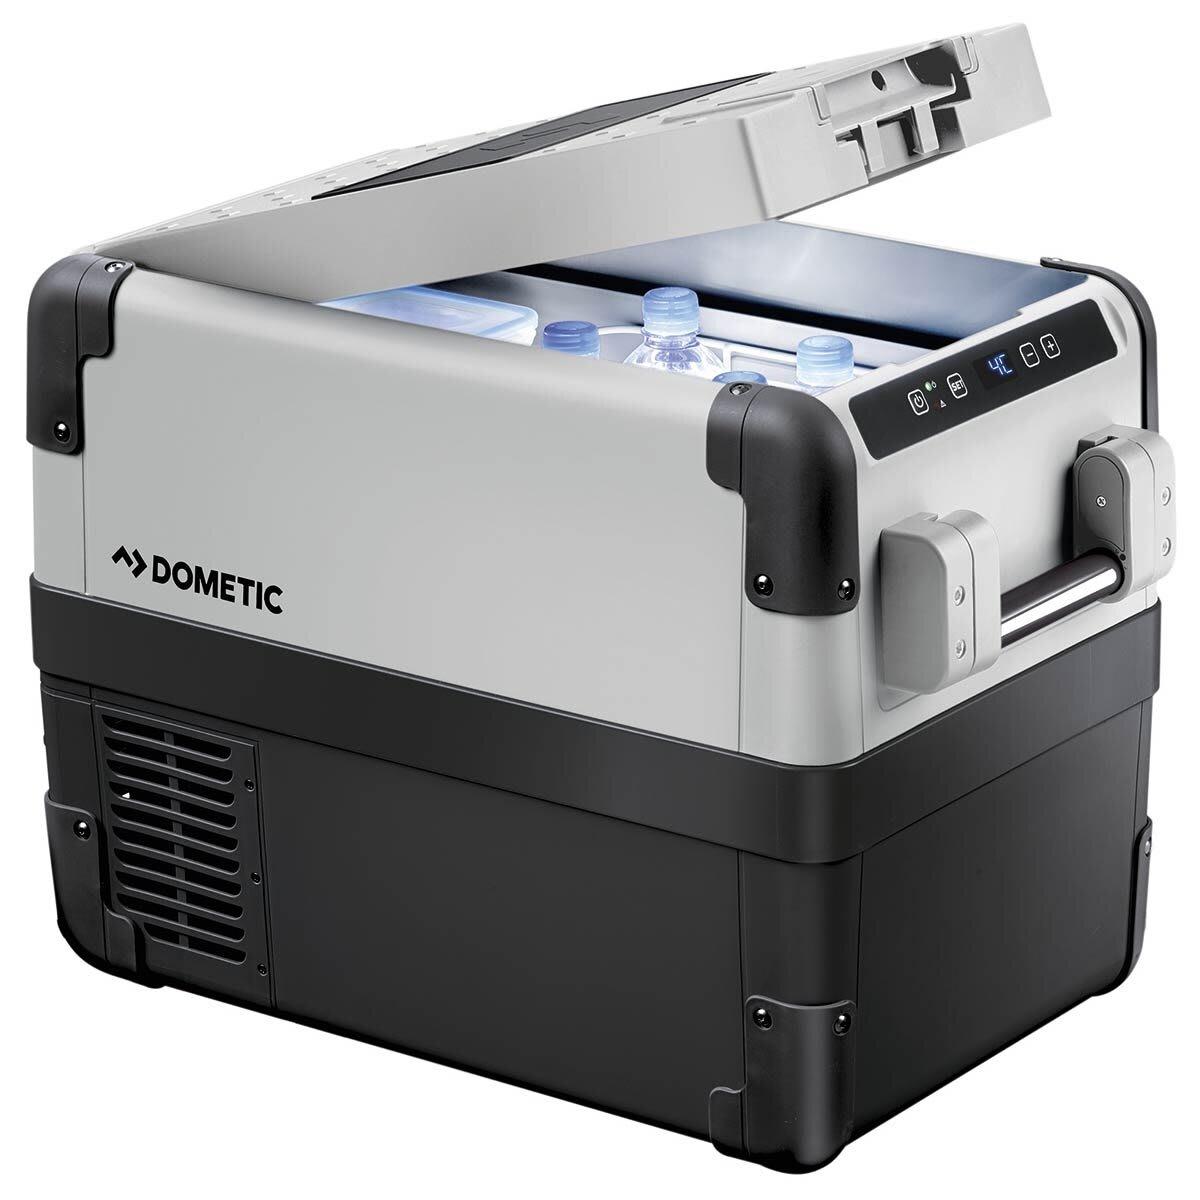 Dometic CFX 28 AC/DC Fridge/Freezer